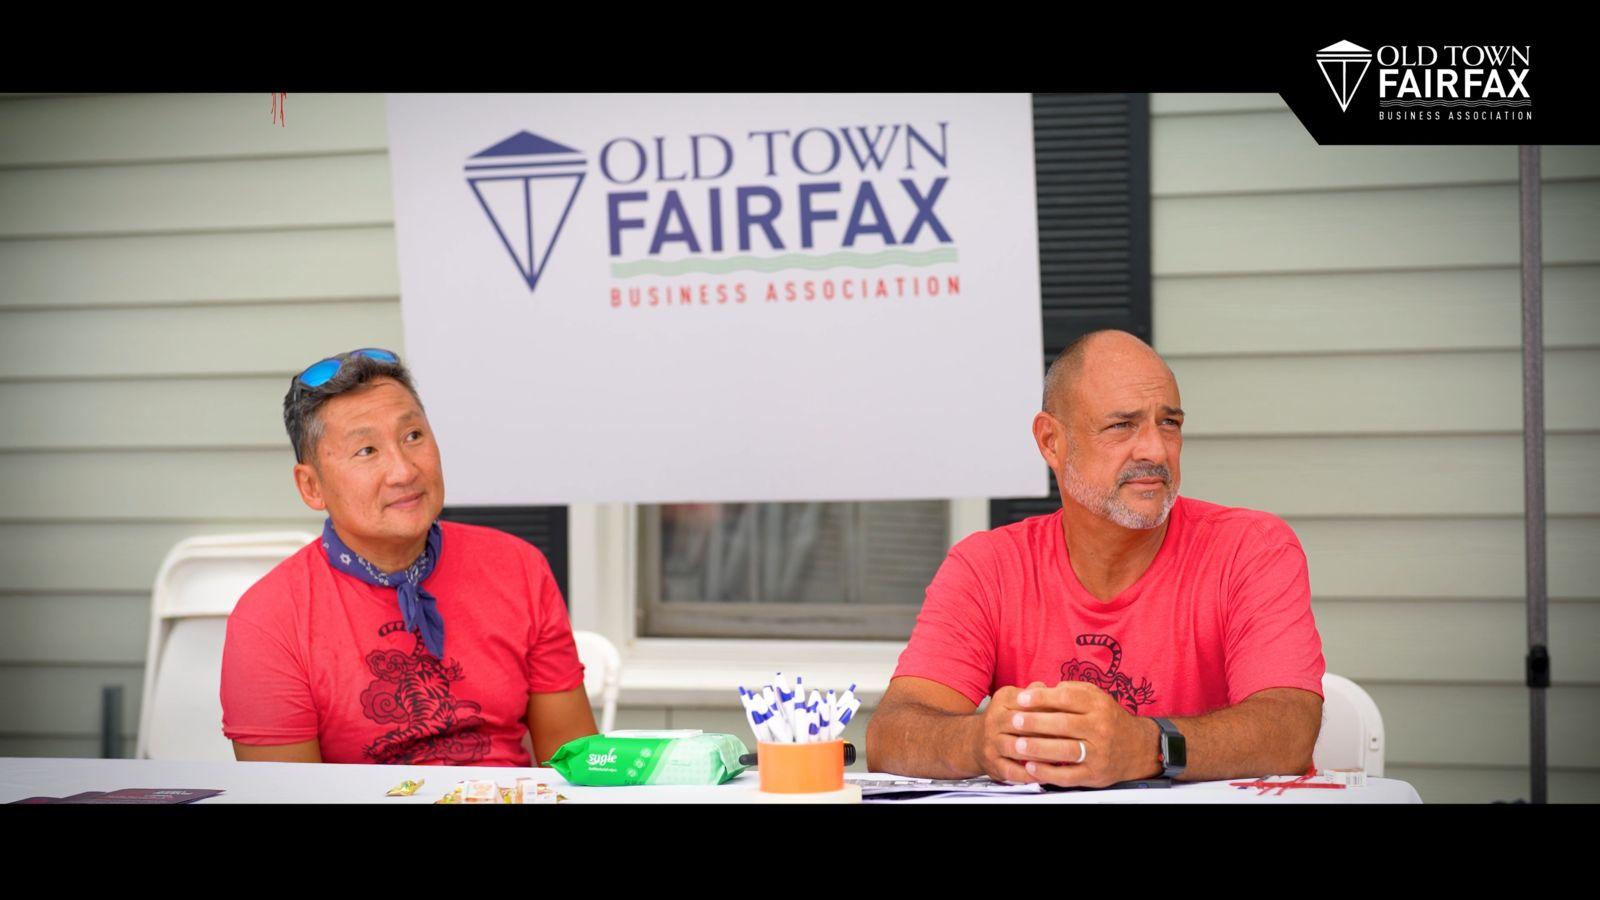 asian festival men at table